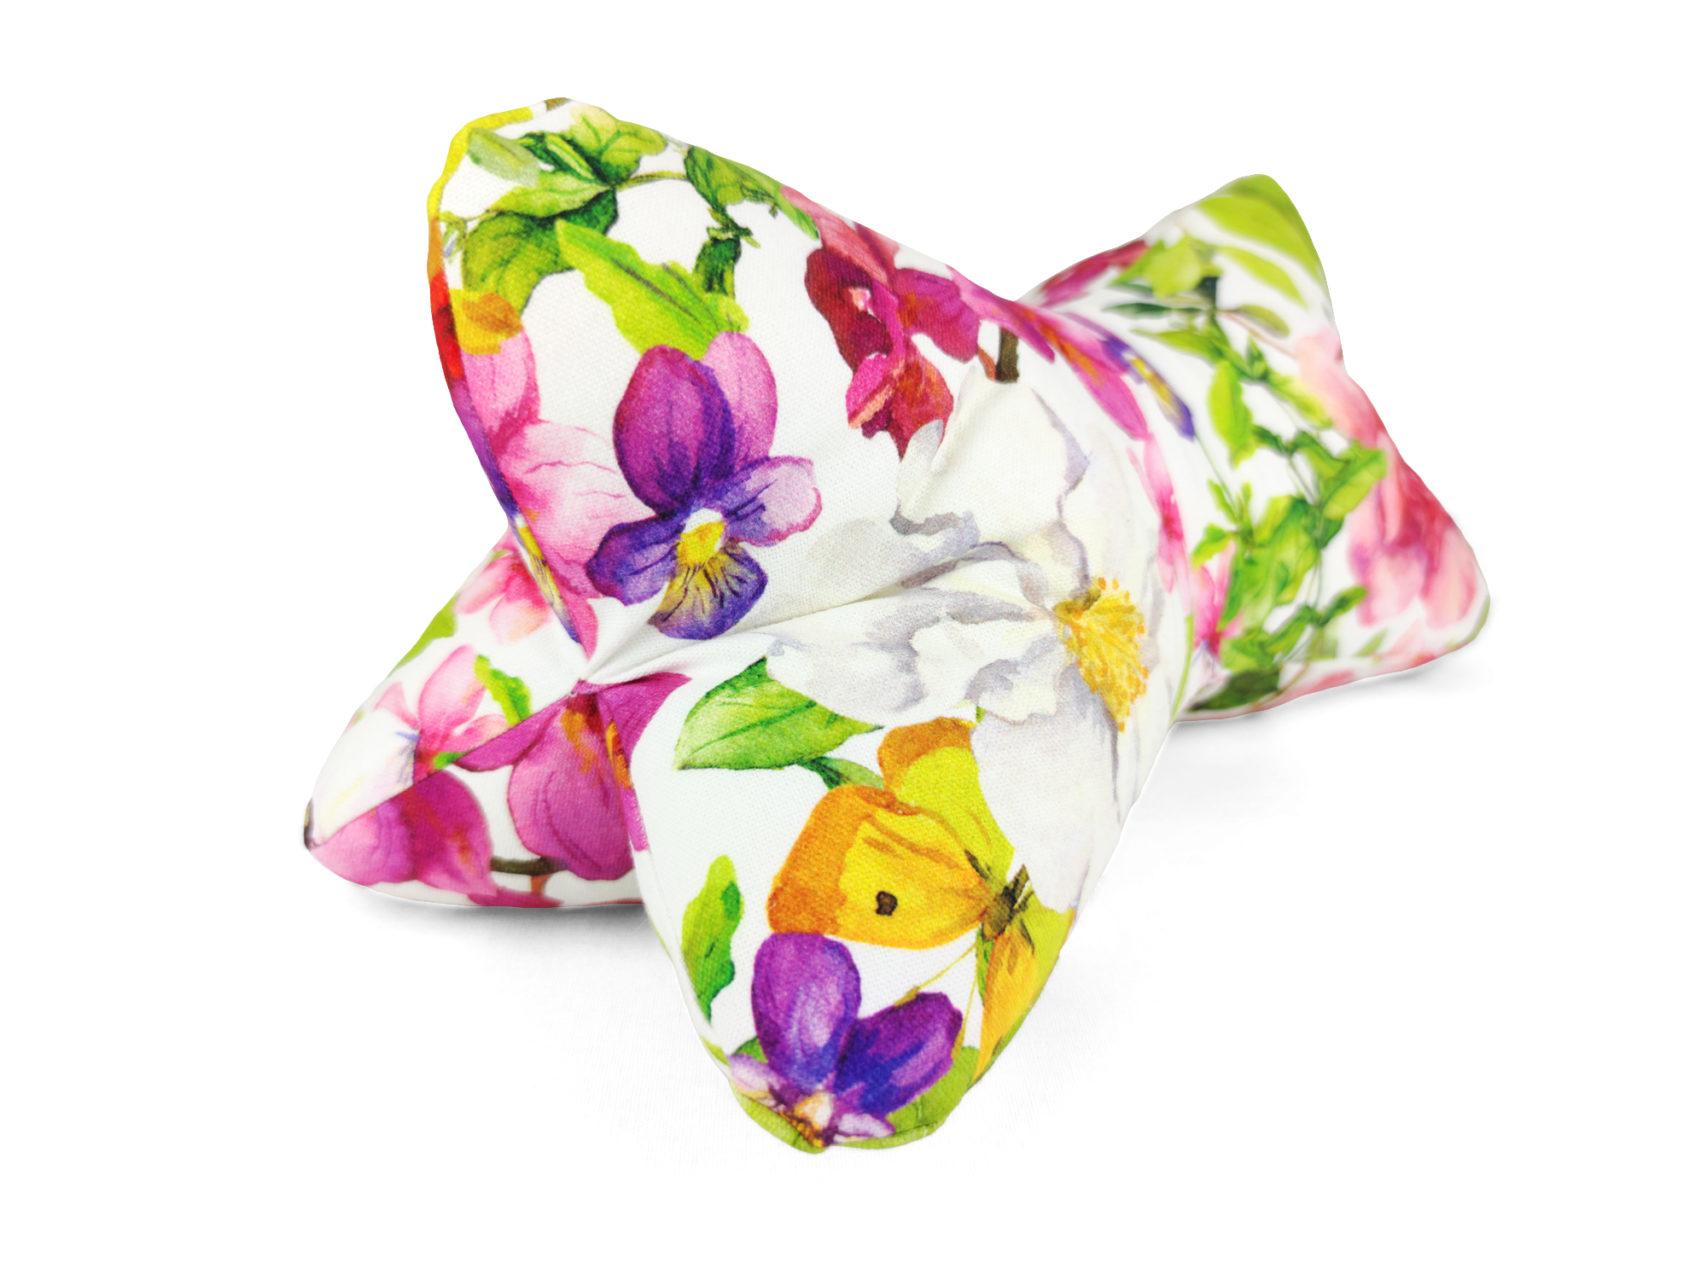 Leseknochen beautiful bloosom bunte Blumen